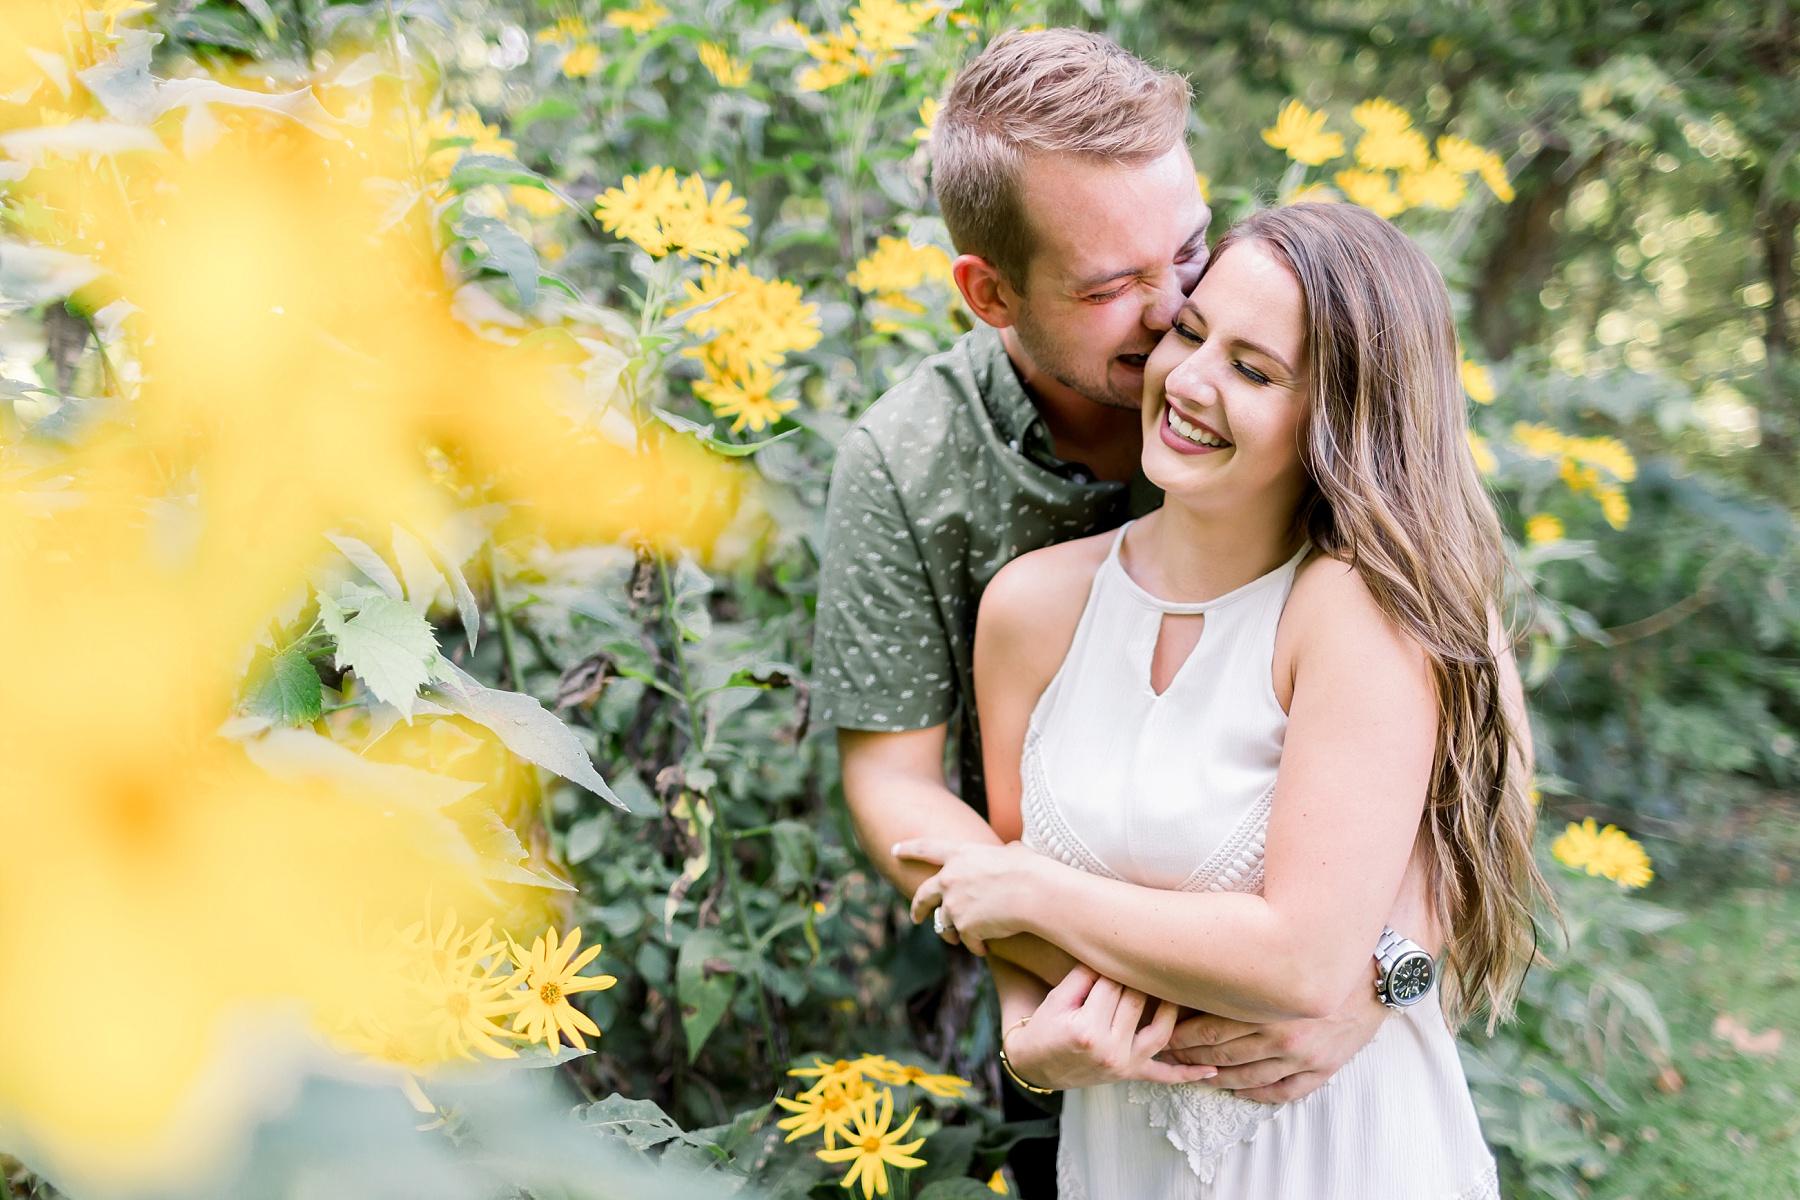 adventurous-authentic-wedding-engagement-photography-kansas-city-elizabeth-ladean-photo_5344.jpg